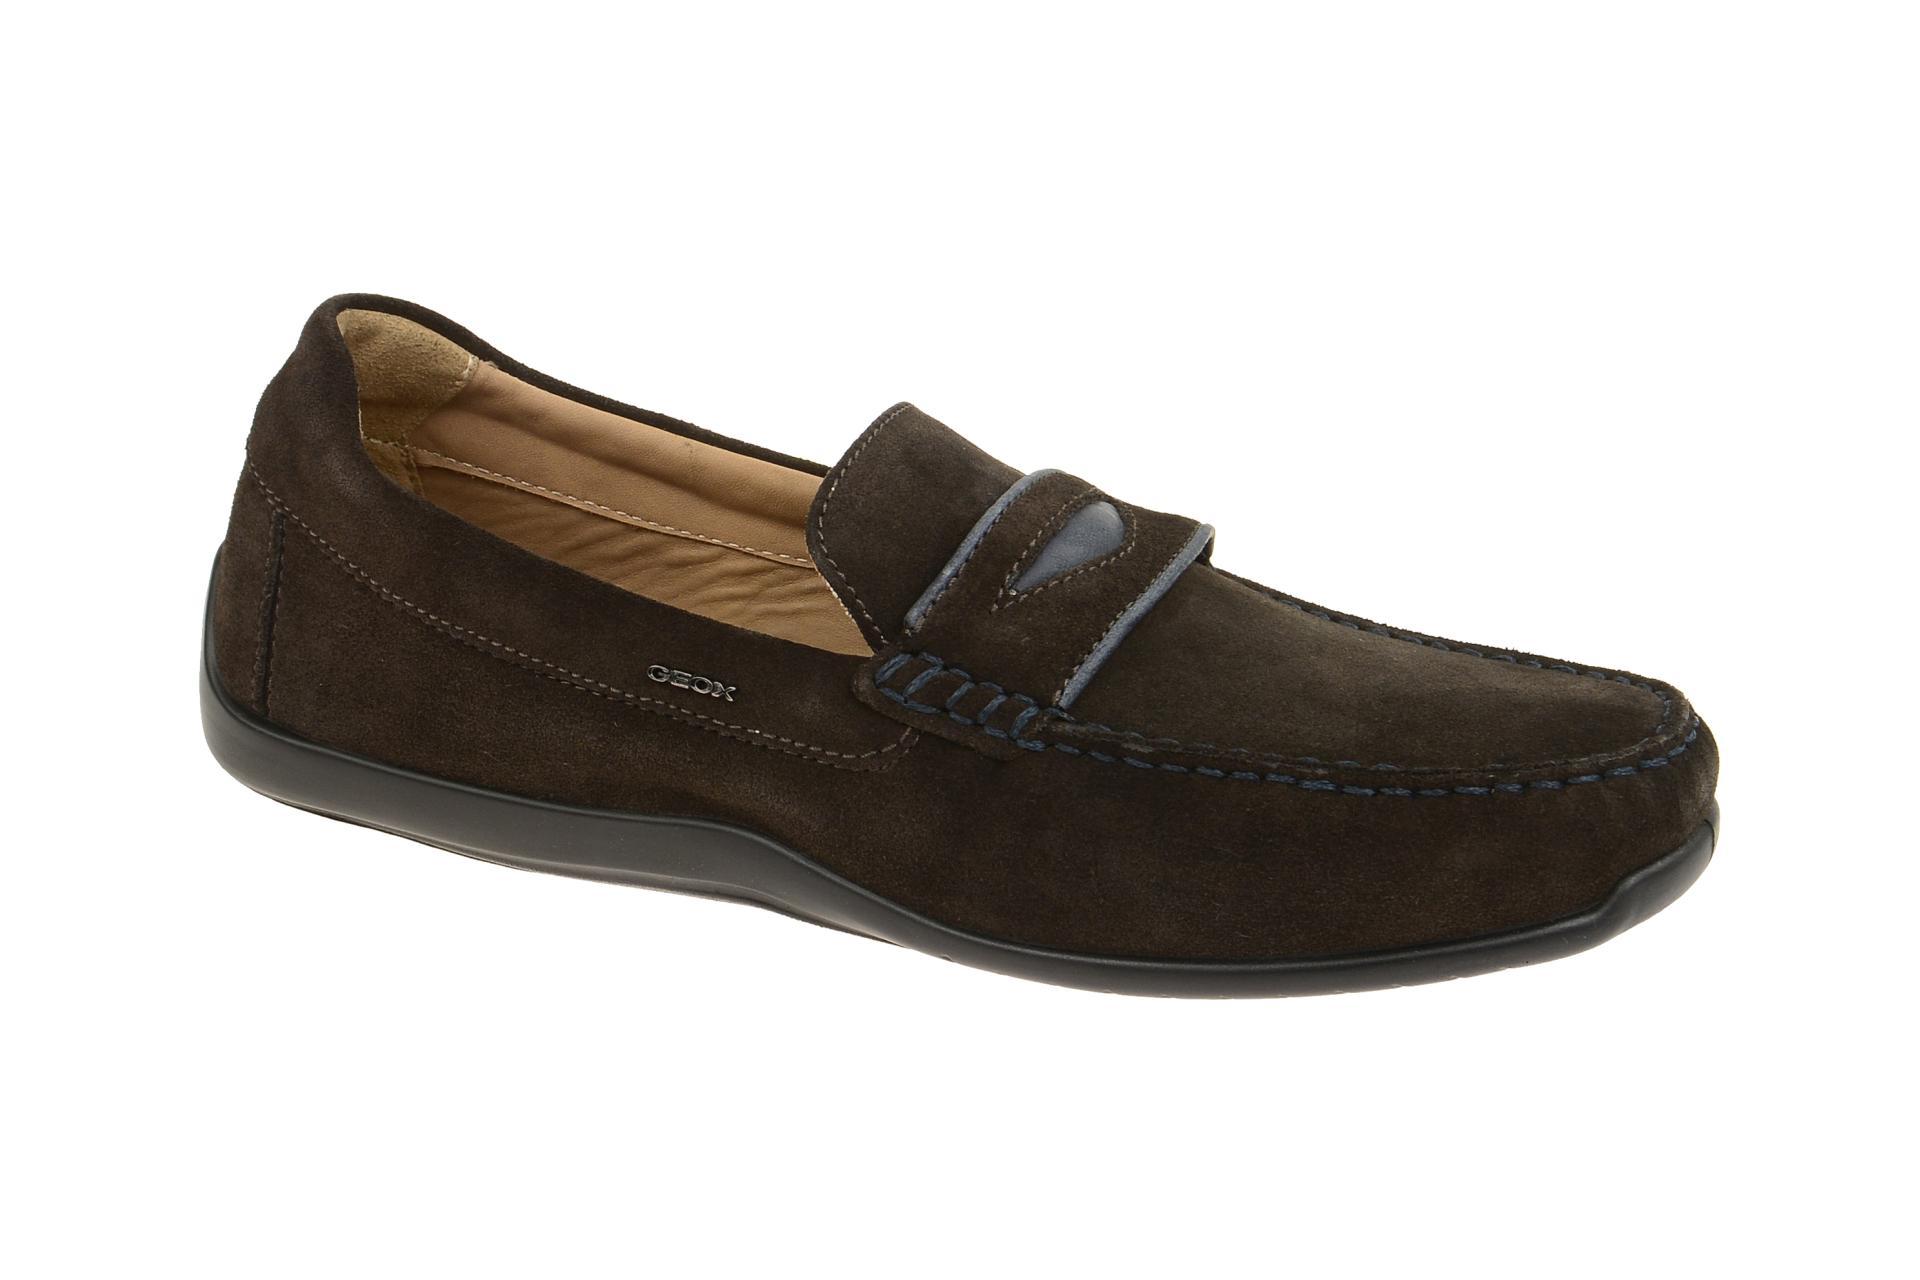 Geox Schuhe XENSE MOX braun Herrenschuhe bequeme Slipper